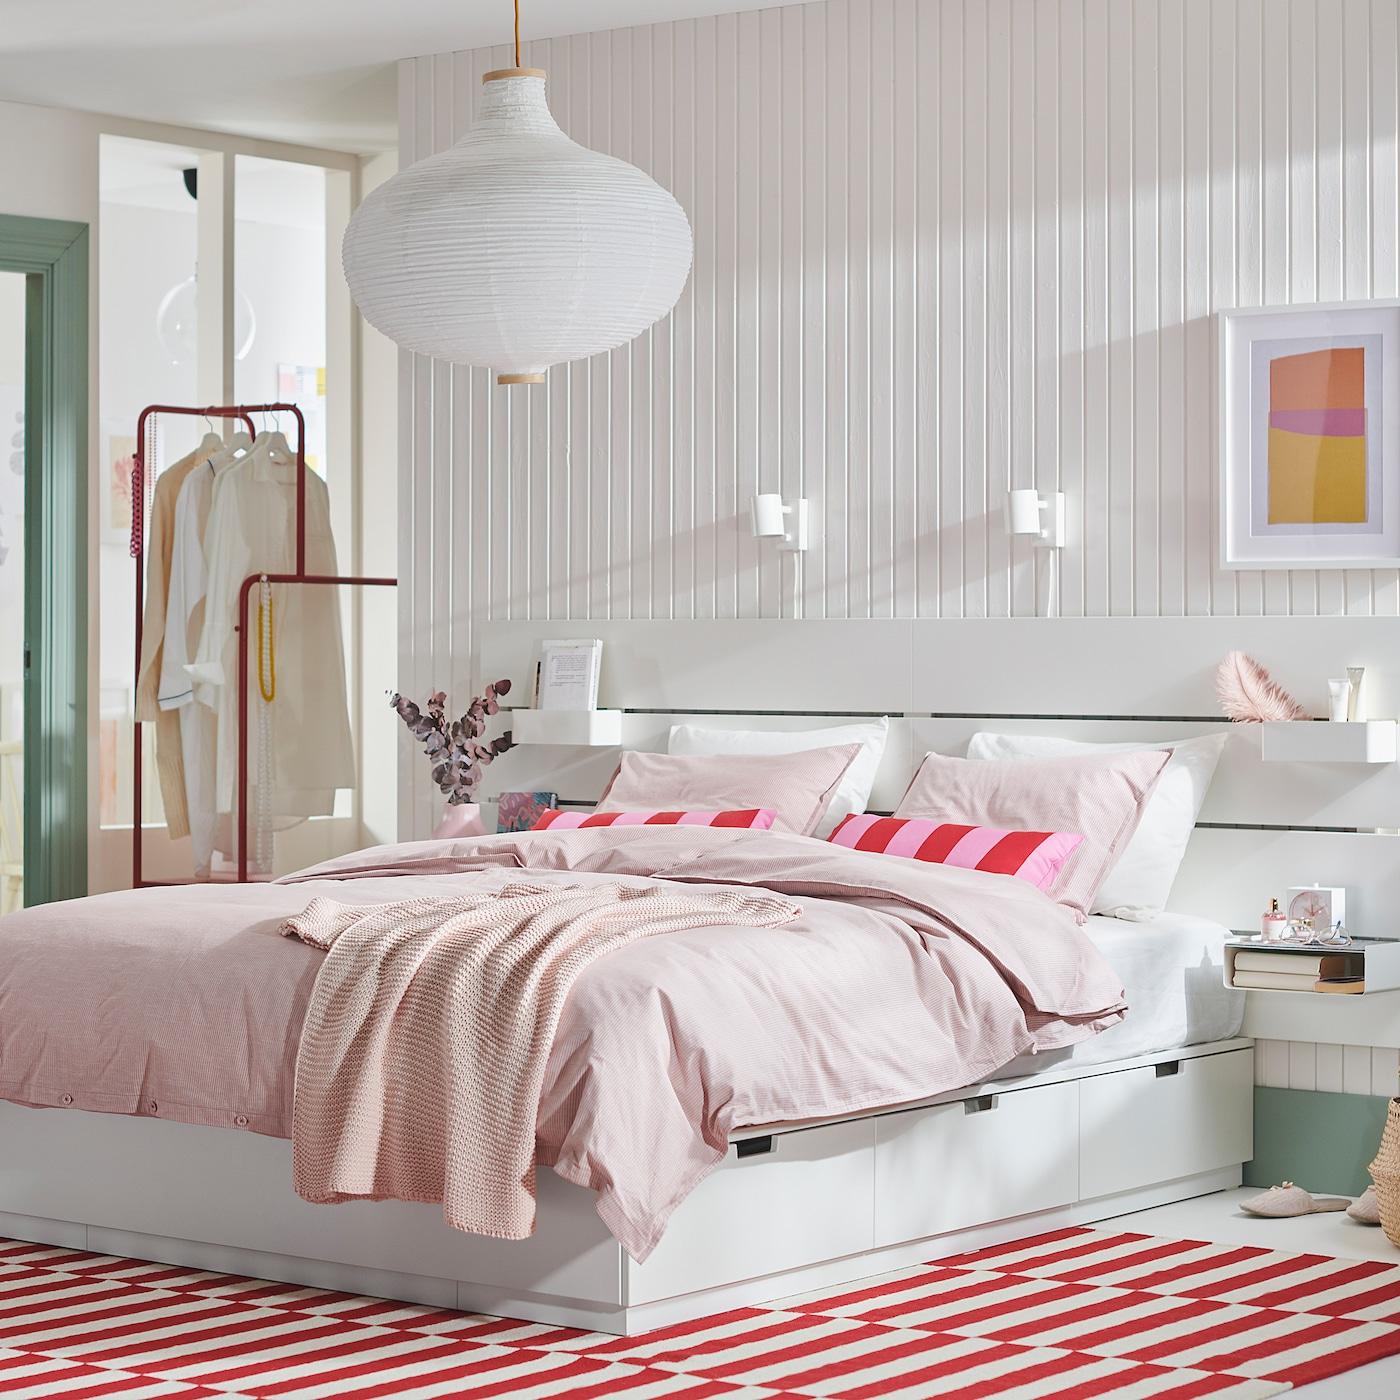 Nordli Bed With Headboard And Storage White Ikea Canada Ikea